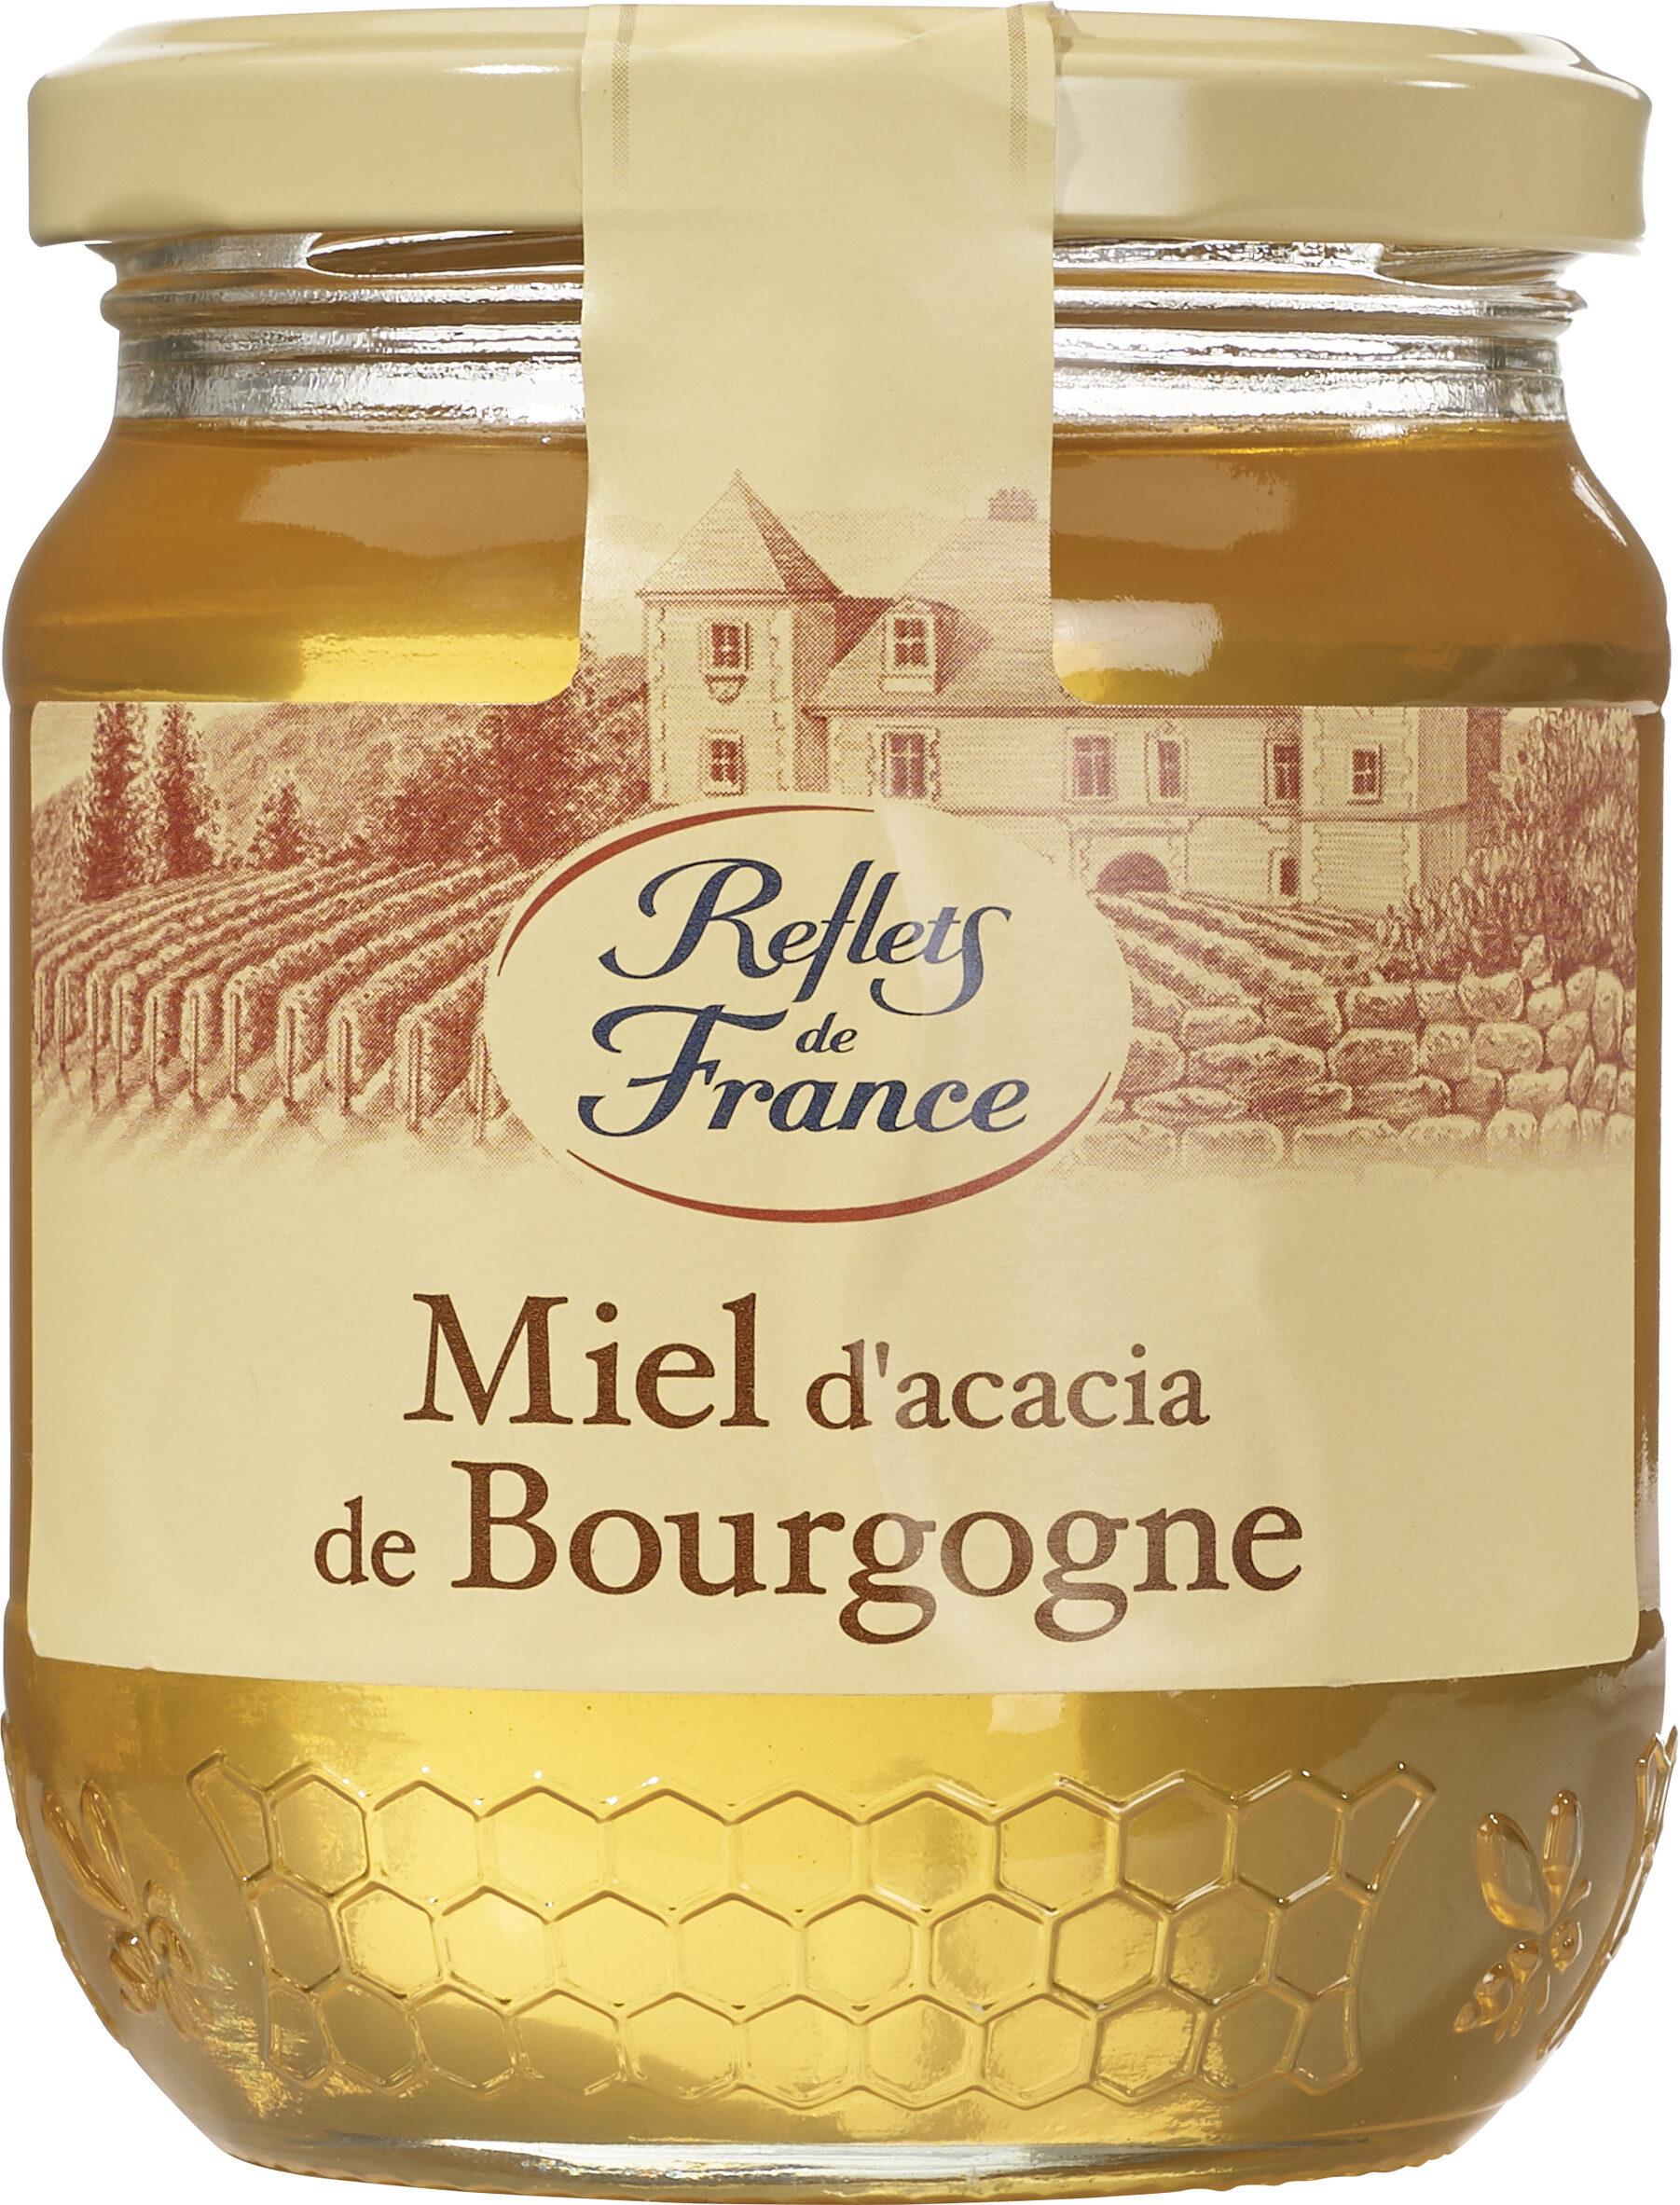 Miel d'acacia de Bourgogne - Produit - fr